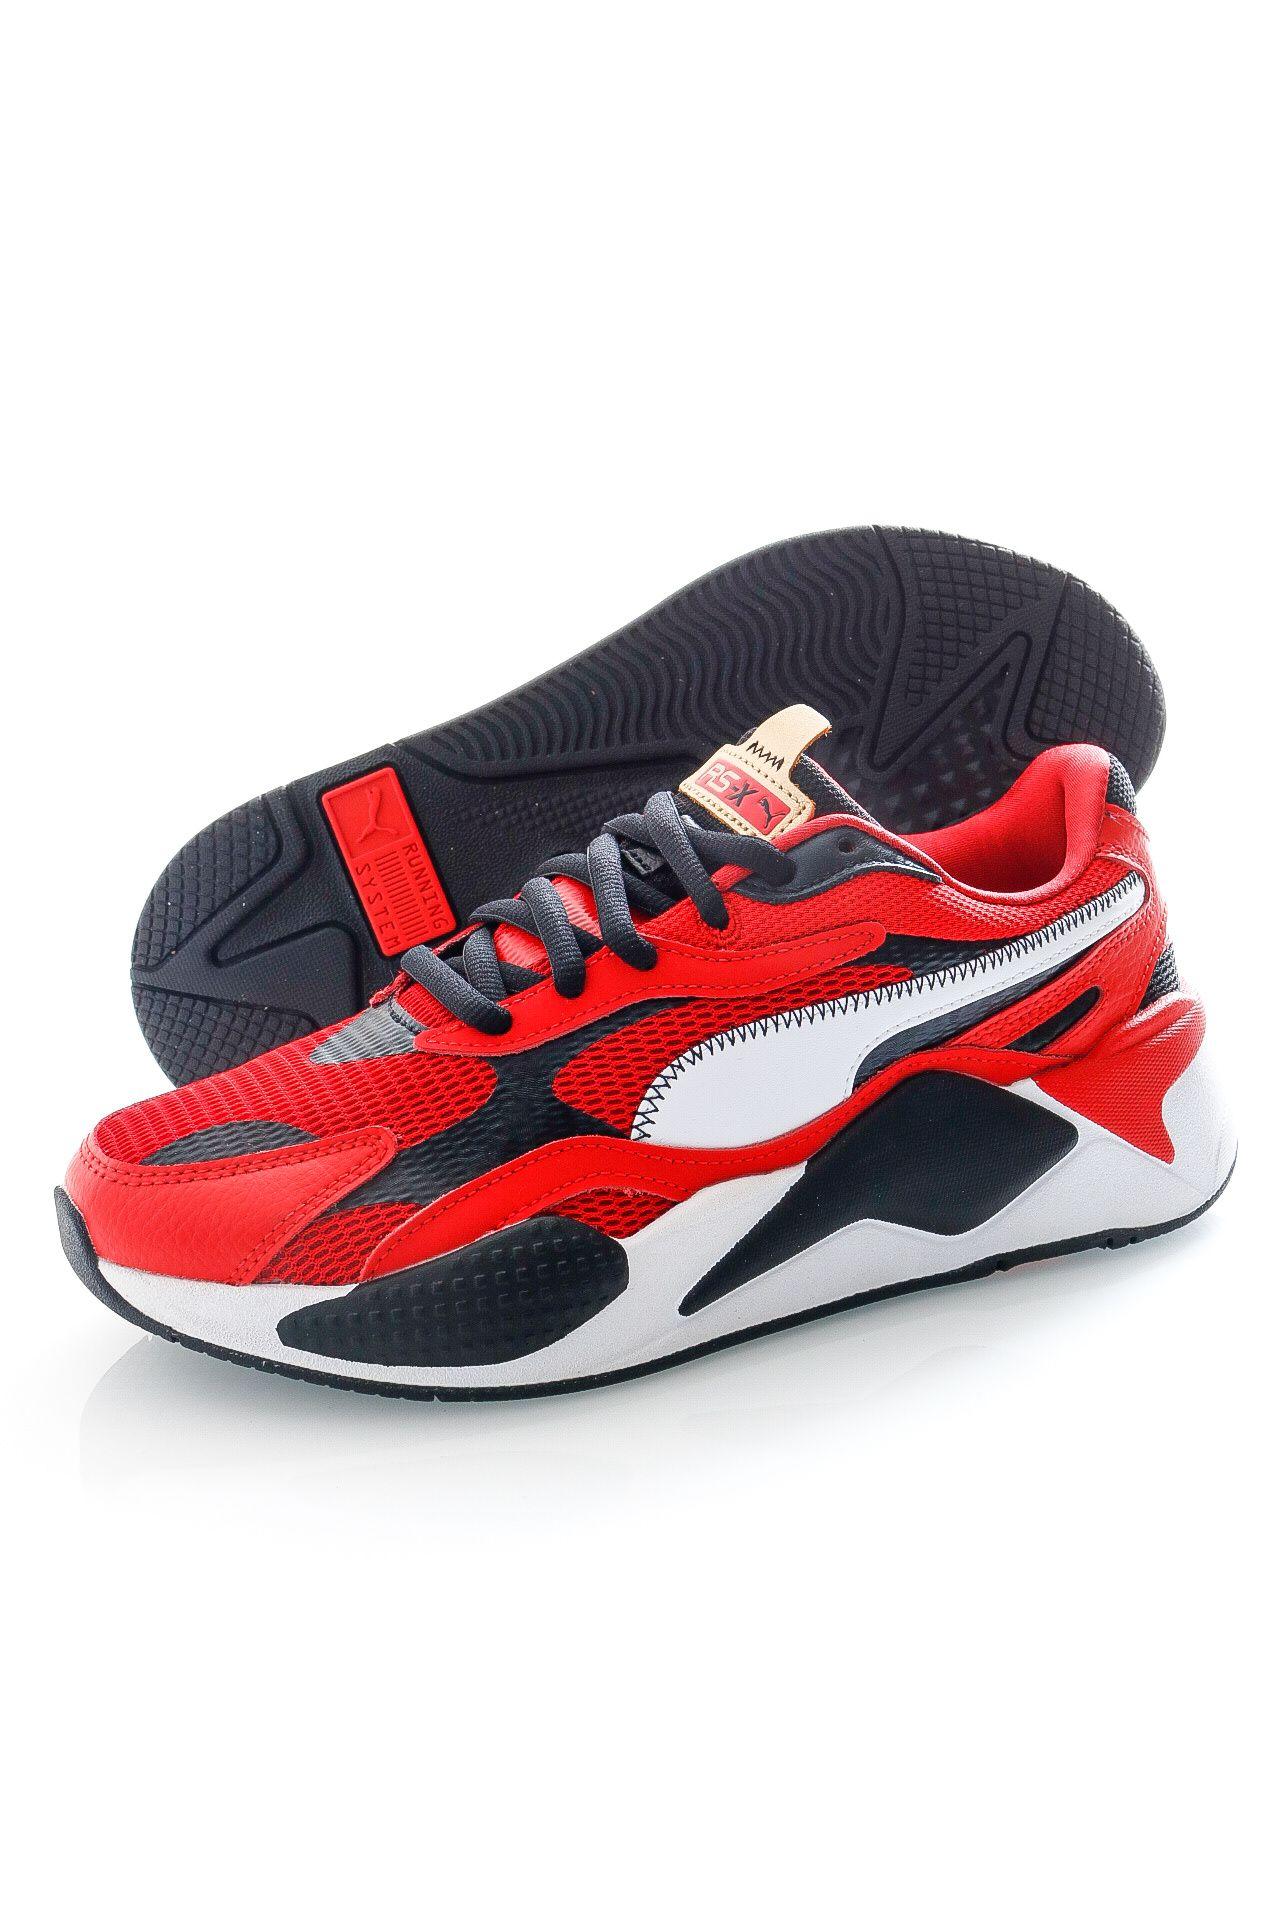 Afbeelding van Puma Sneakers RS-X³ CNY High Risk Red-Puma White-Puma Black 37317